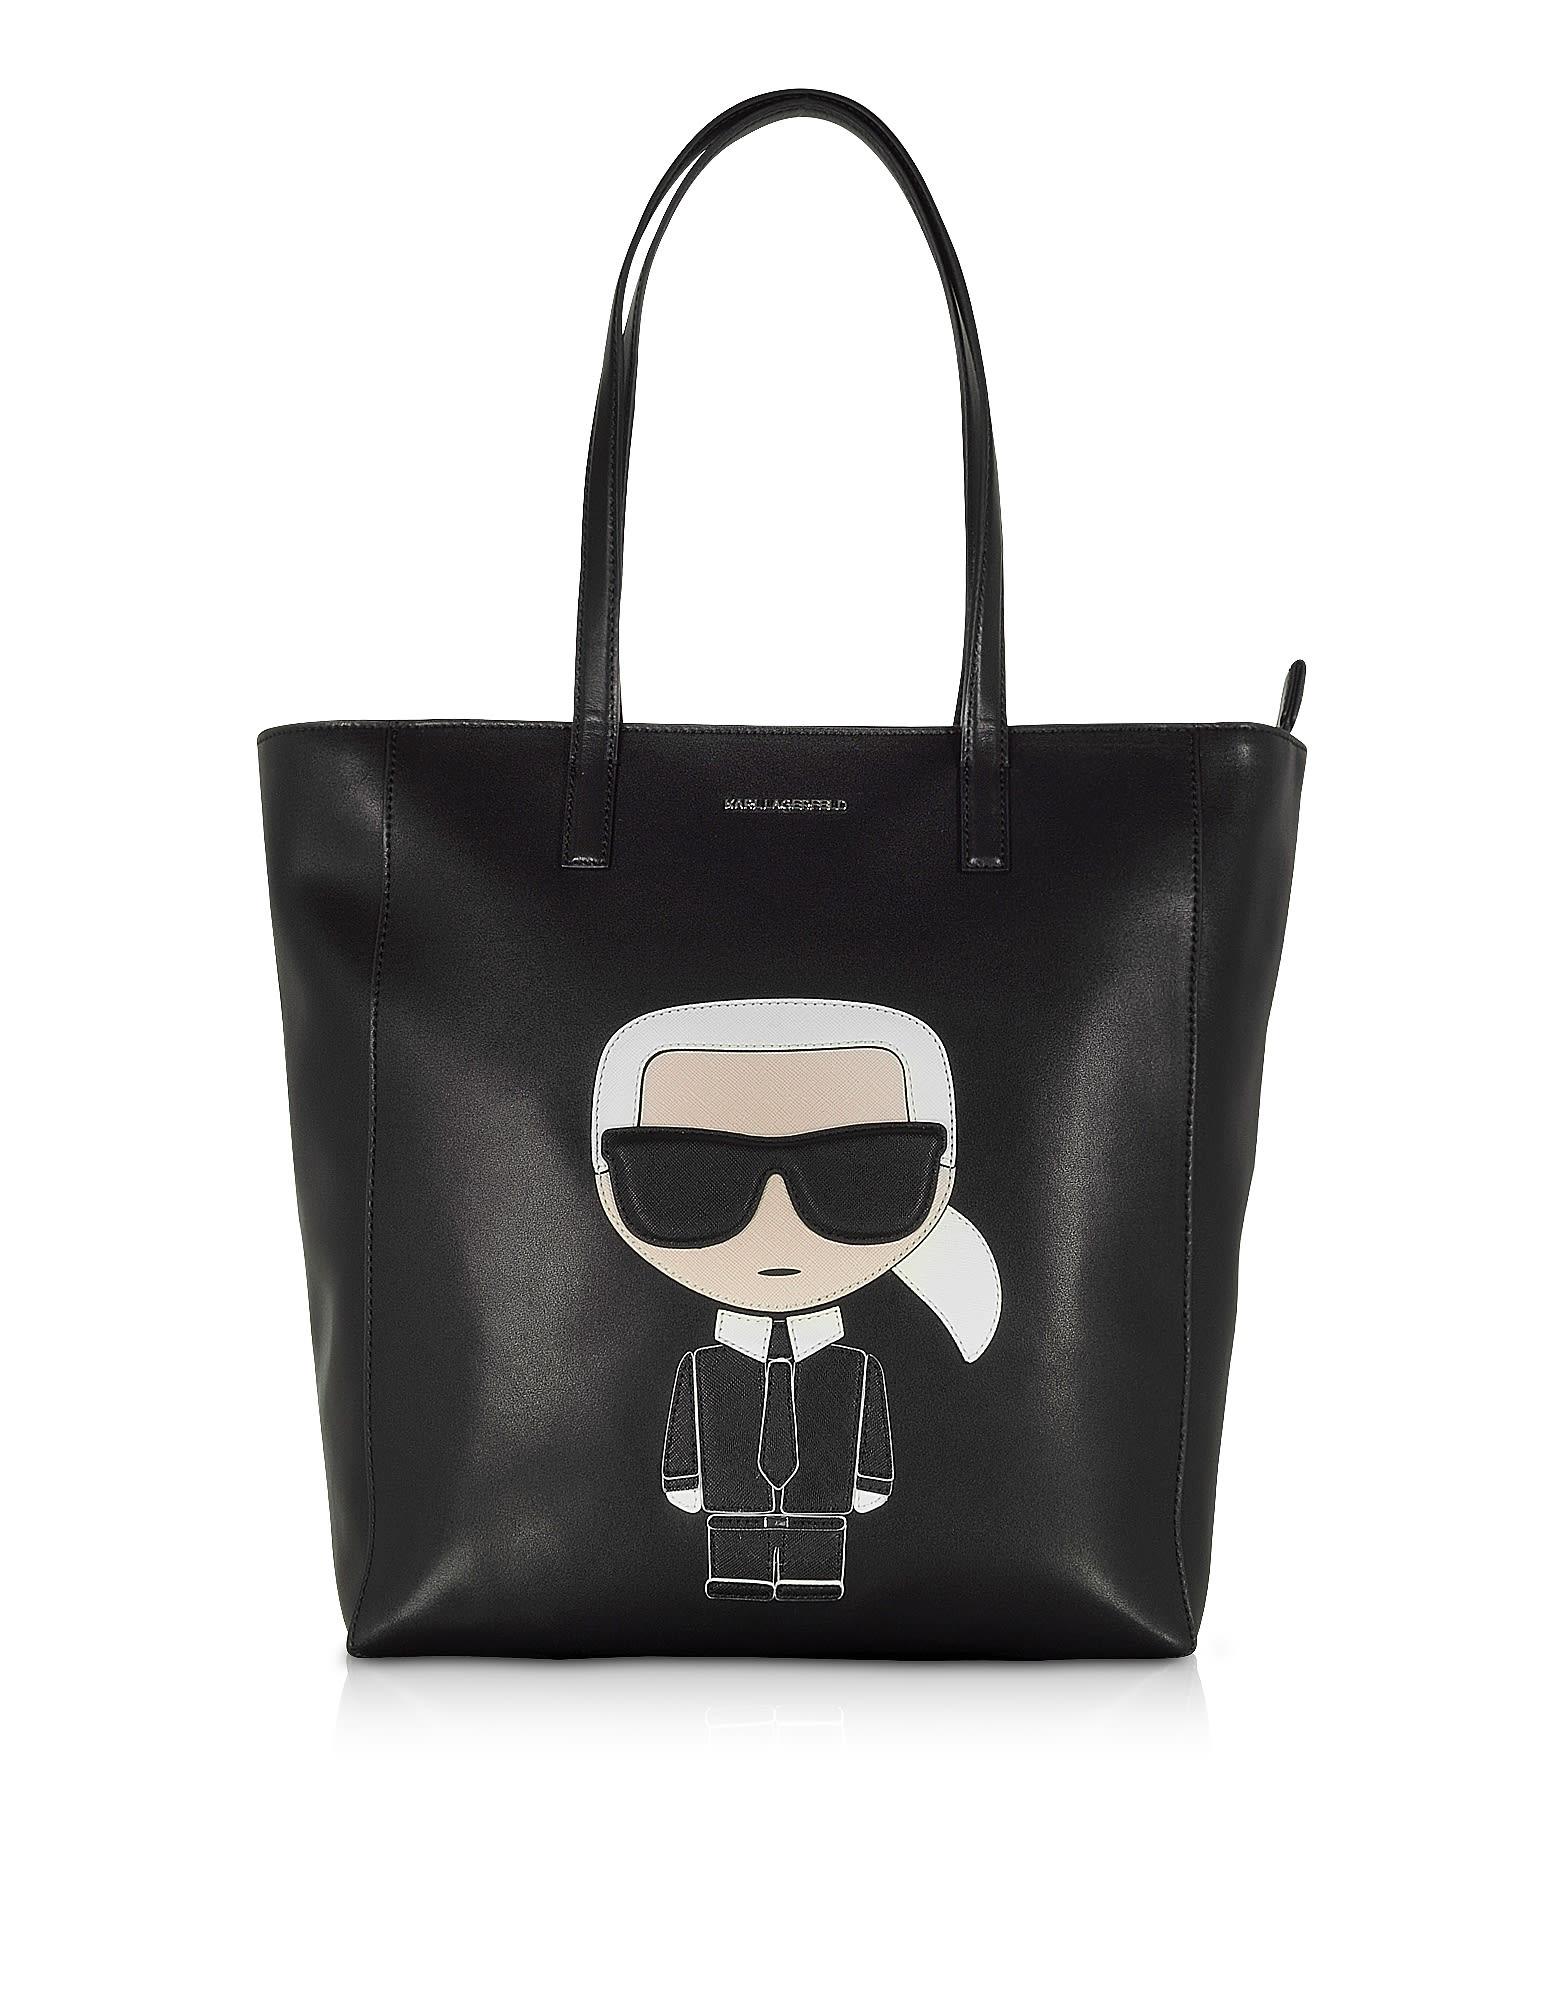 Karl Lagerfeld Totes K/IKONIK SOFT TOTE BAG